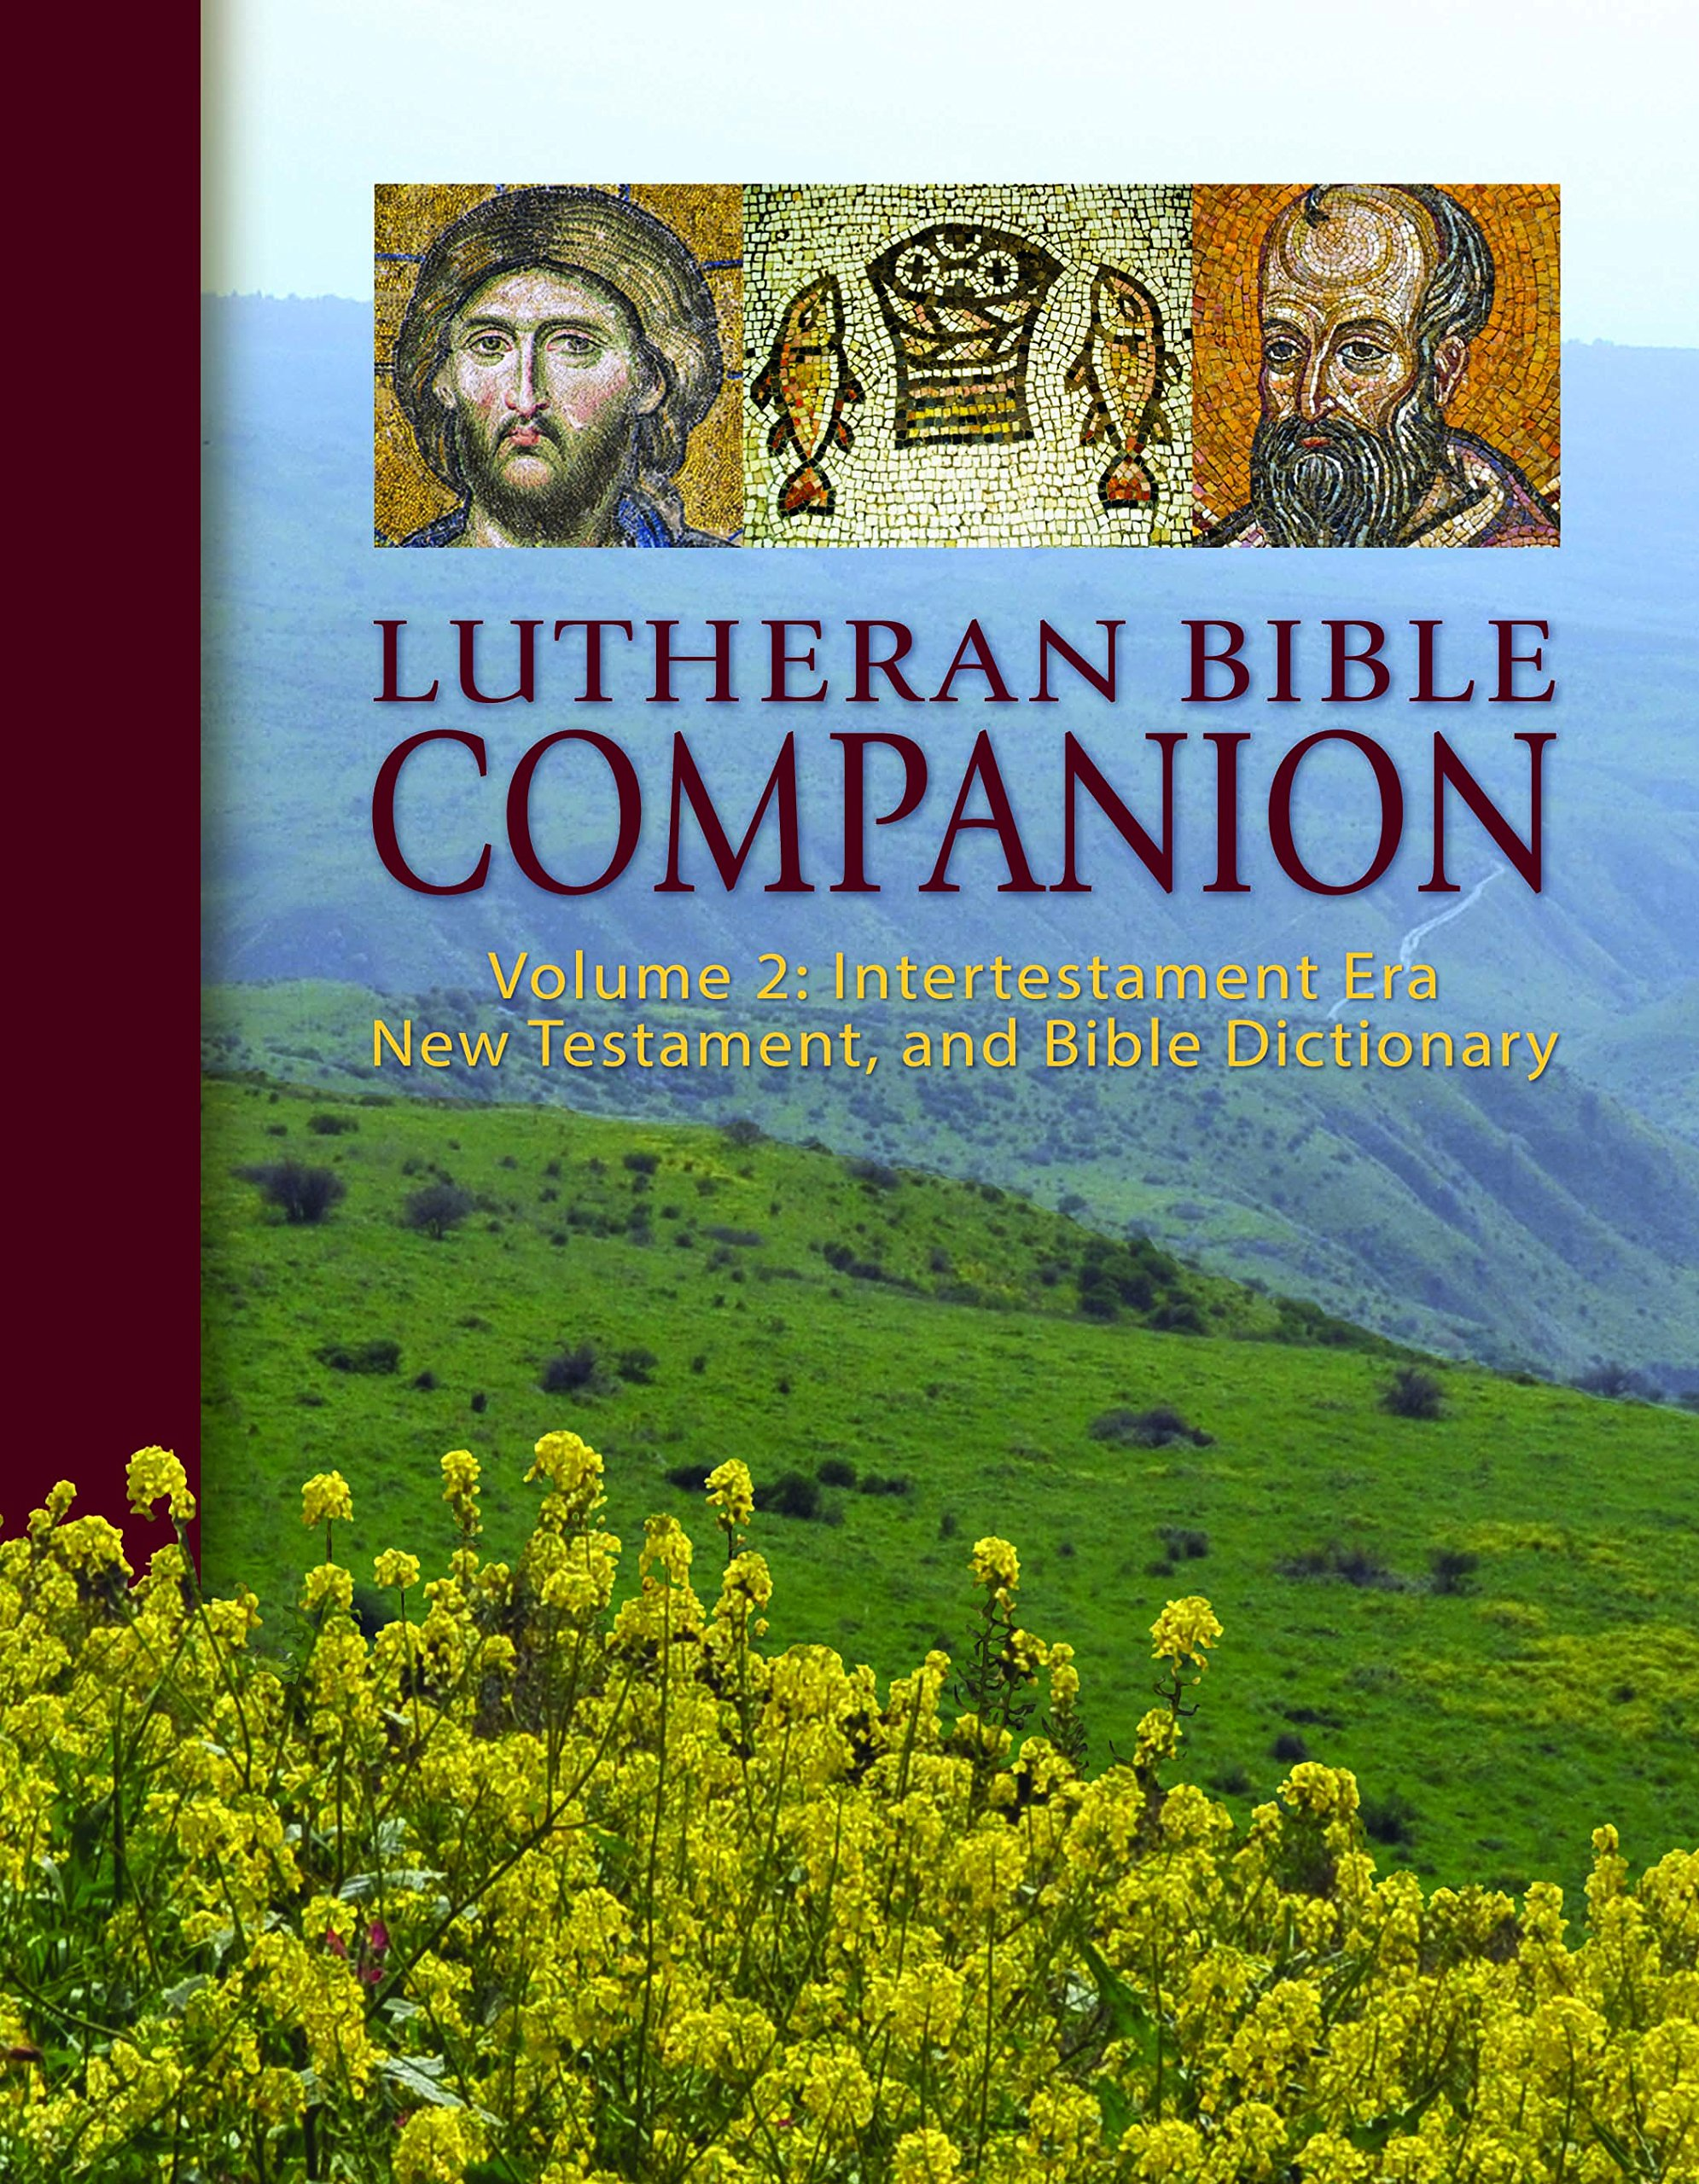 Lutheran Bible Companion Volume 2: Intertestamental, New Testament, and Bible Dictionary pdf epub